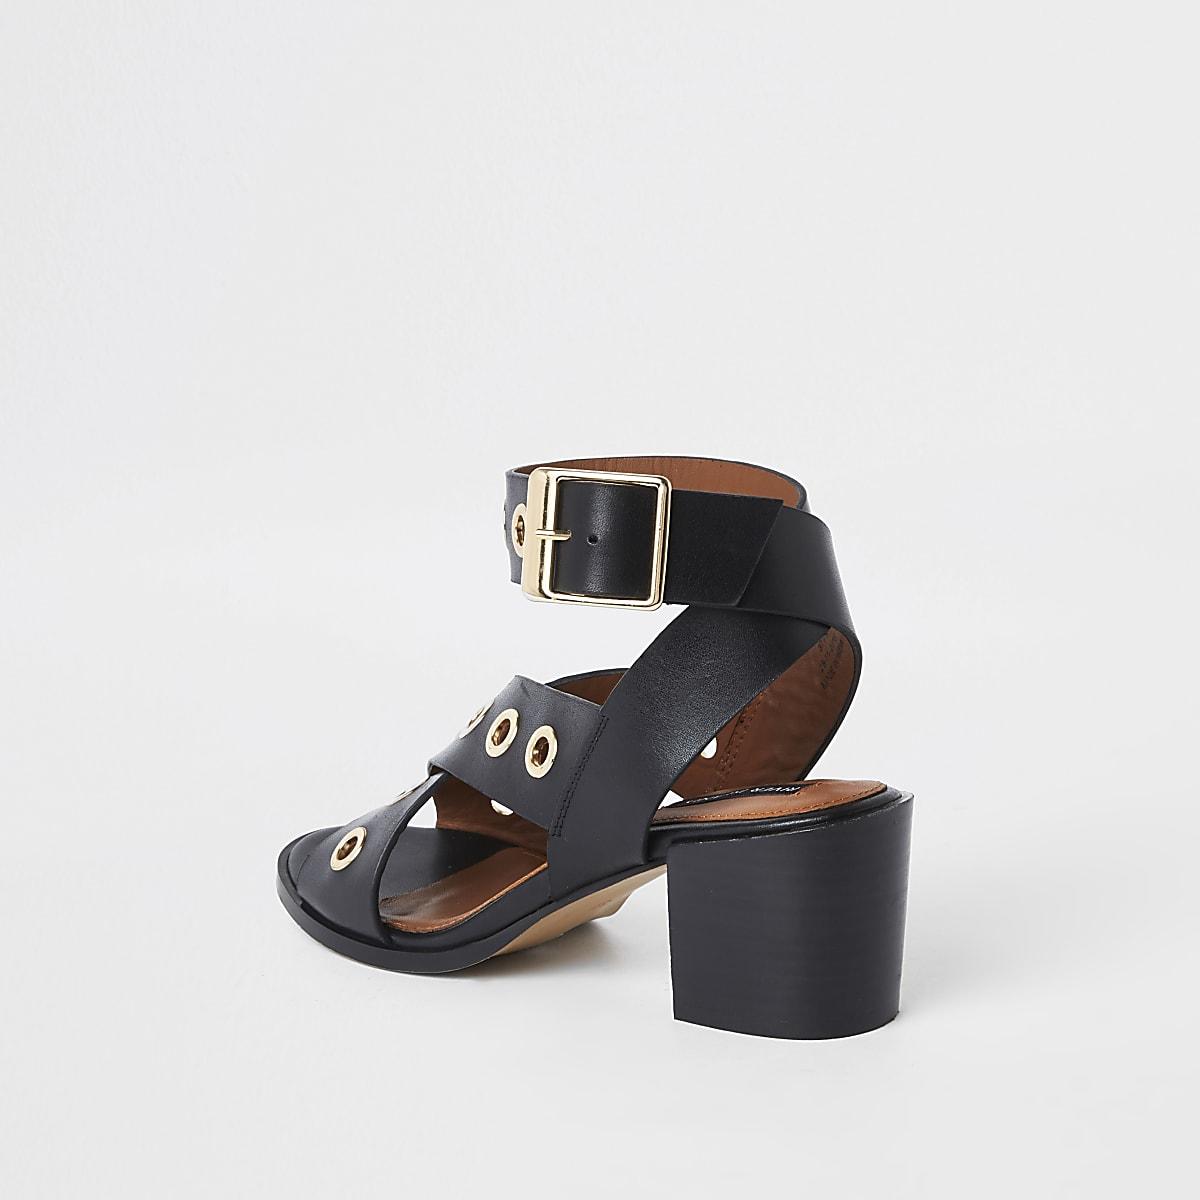 b63d5e359e00 Black leather eyelet block heel sandals - Sandals - Shoes   Boots ...